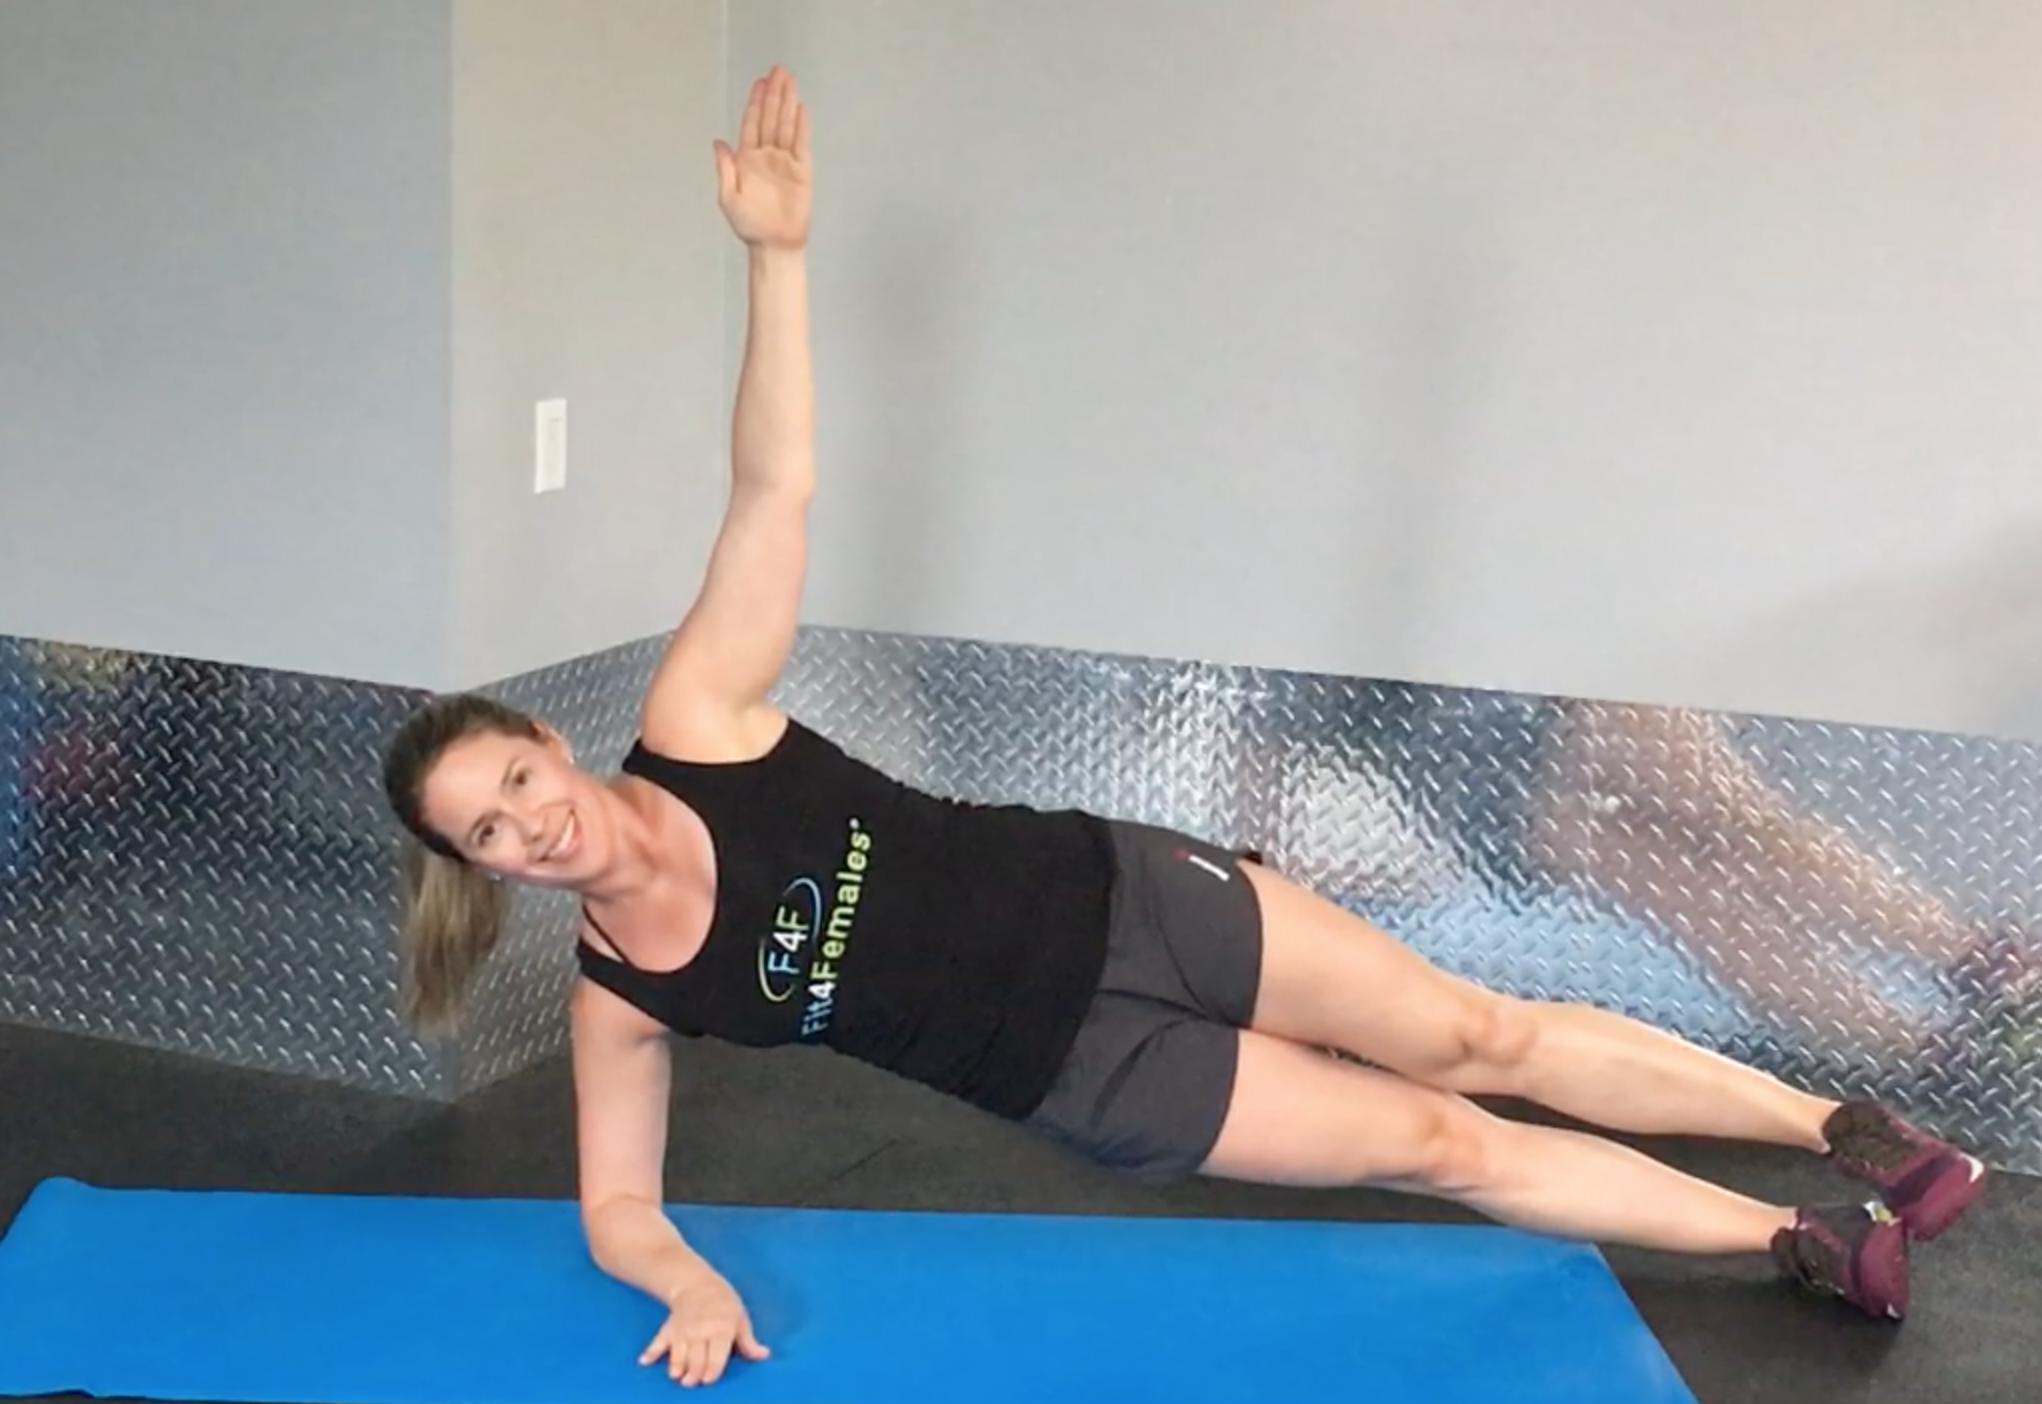 abs-core-2b-Full-Side-Plank